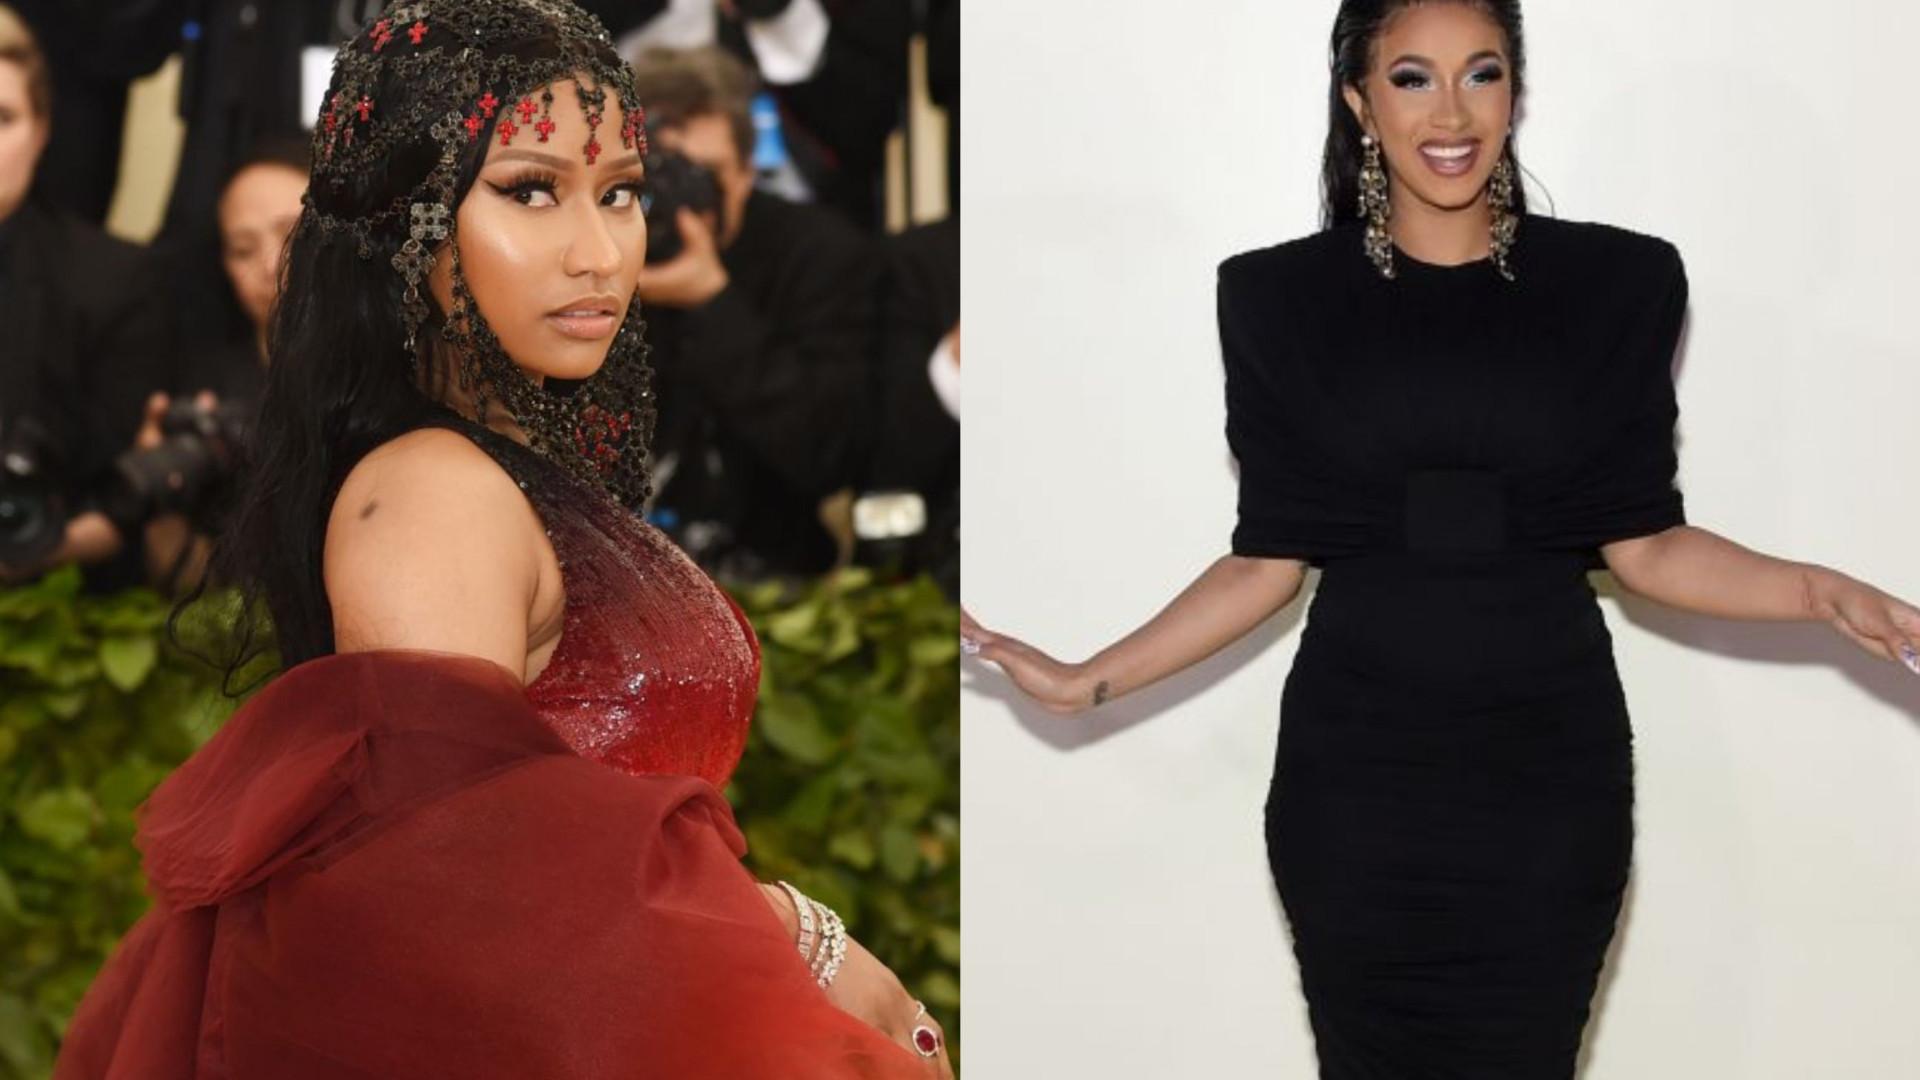 Nicki Minaj quebra silêncio após barraco com Cardi B